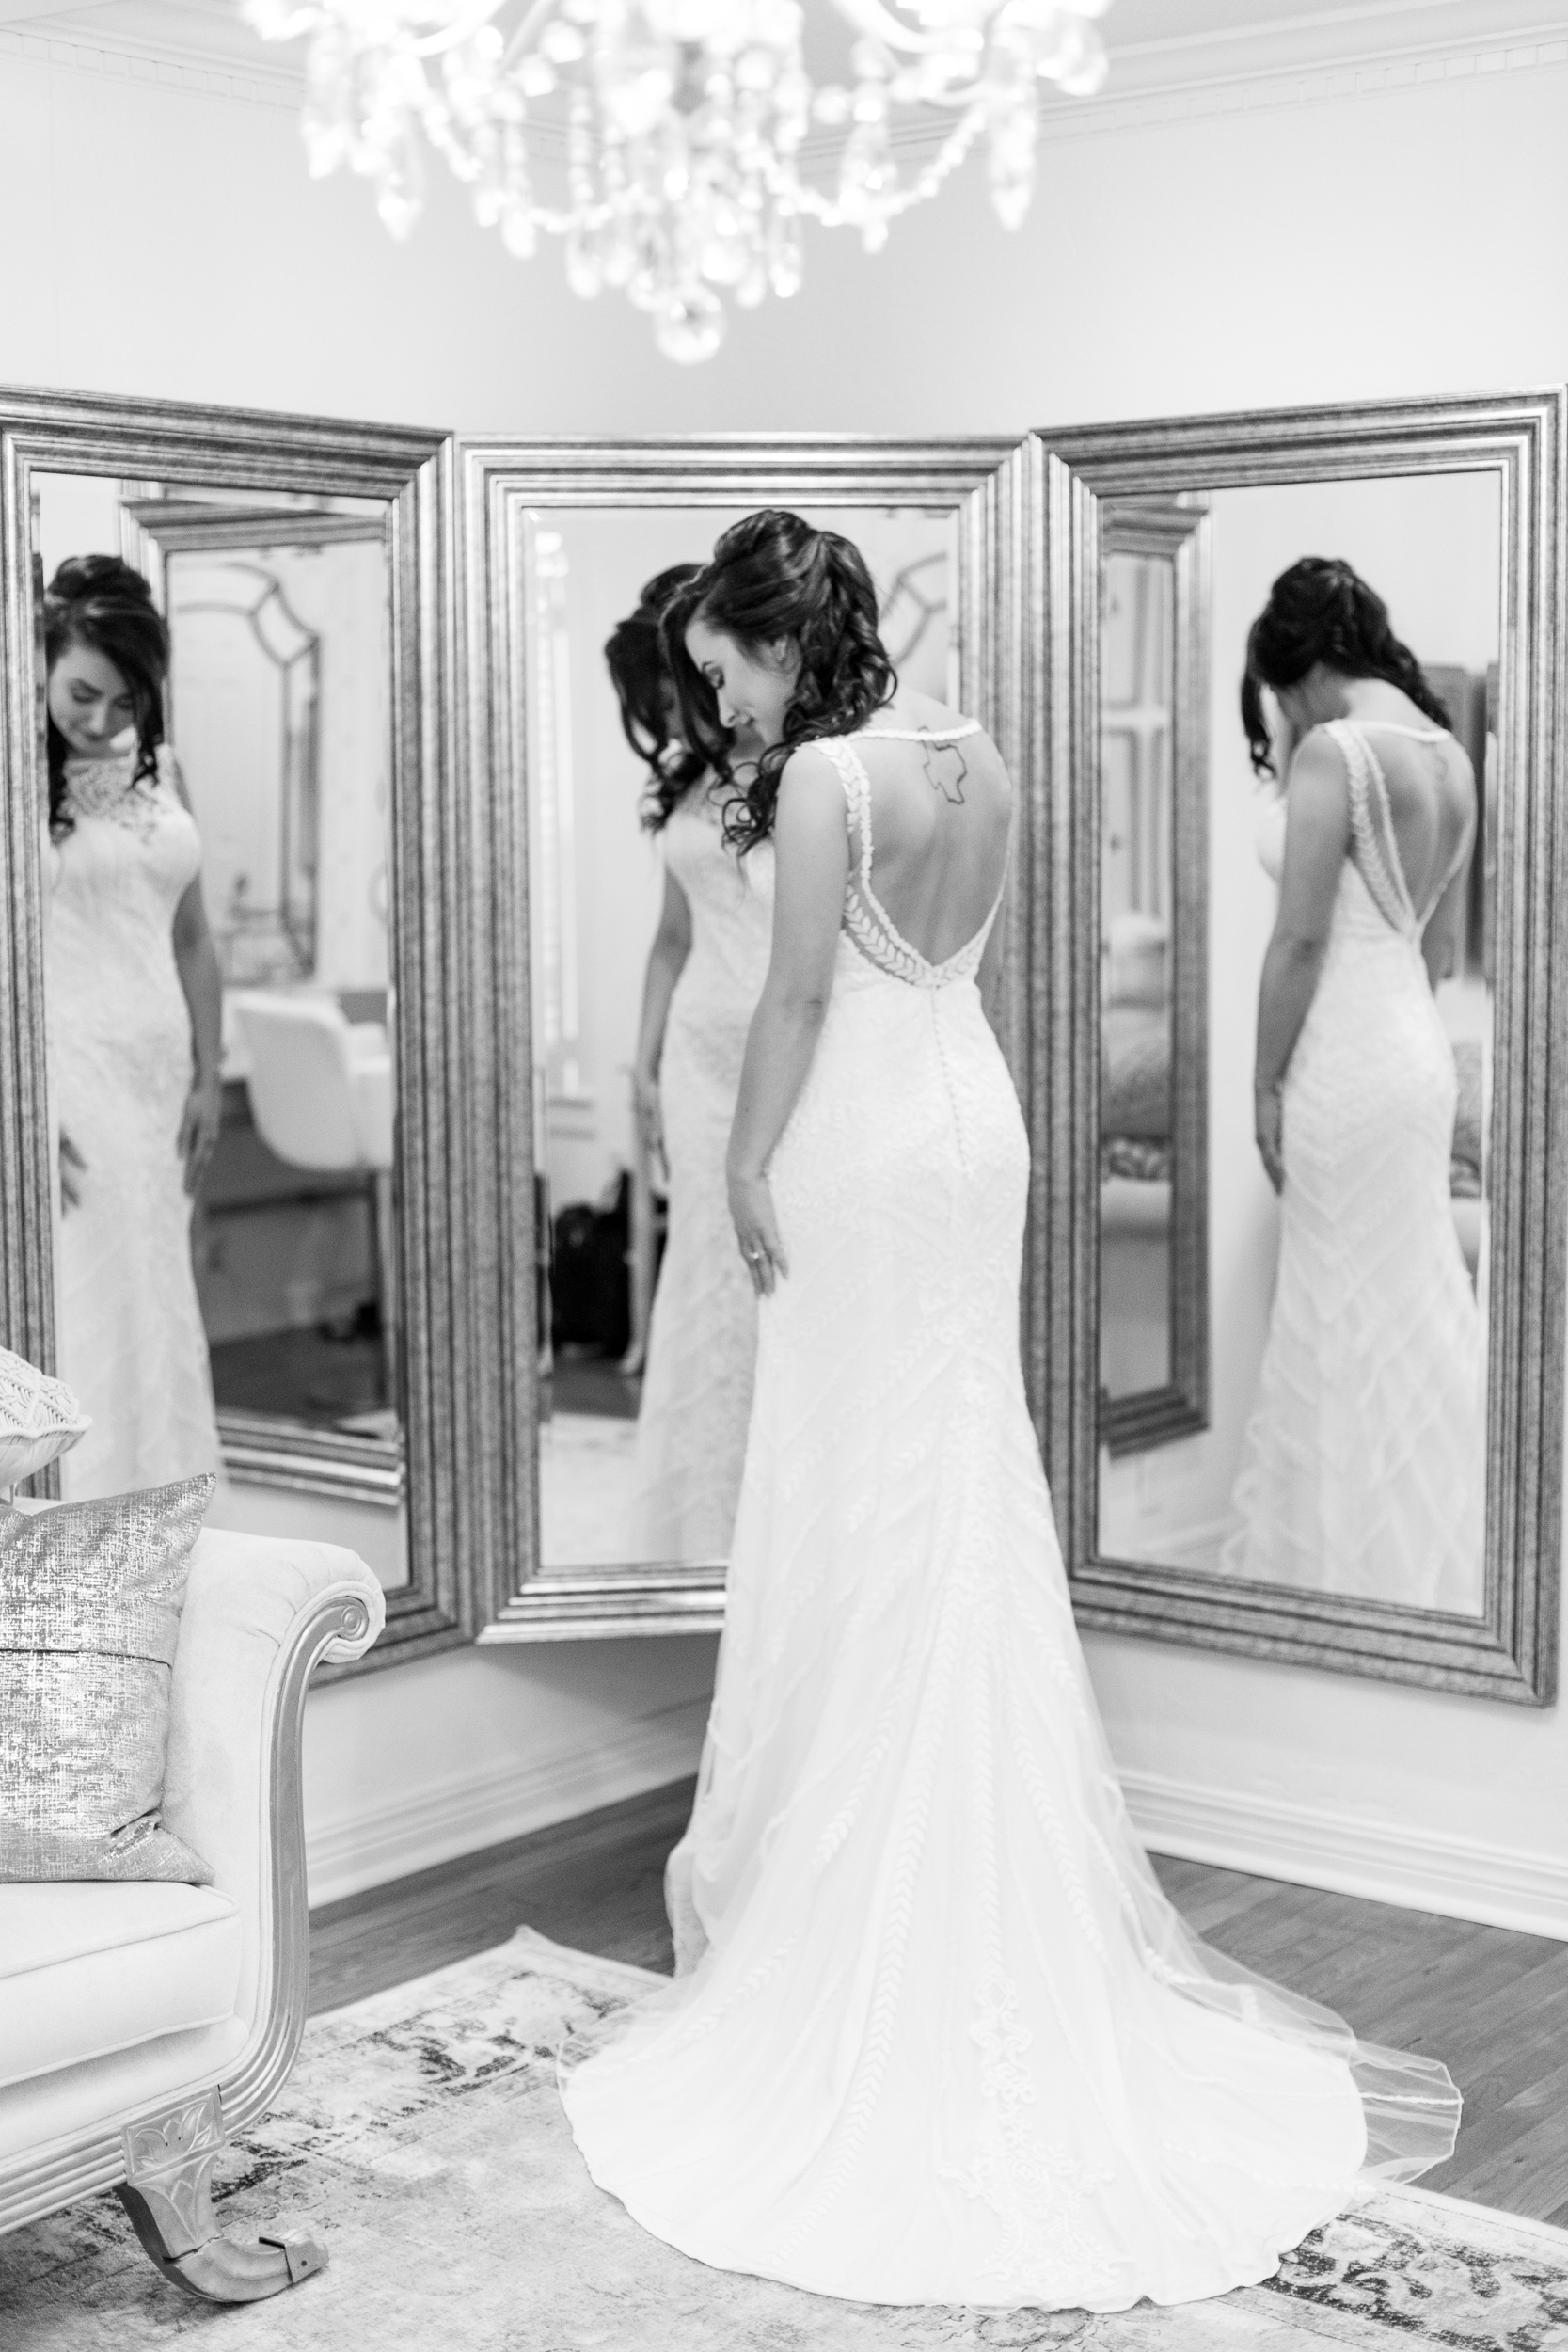 Zihlman-East TX Wedding_Kelsie Hendricks Photography_The Folmar Tyler Texas-59.jpg